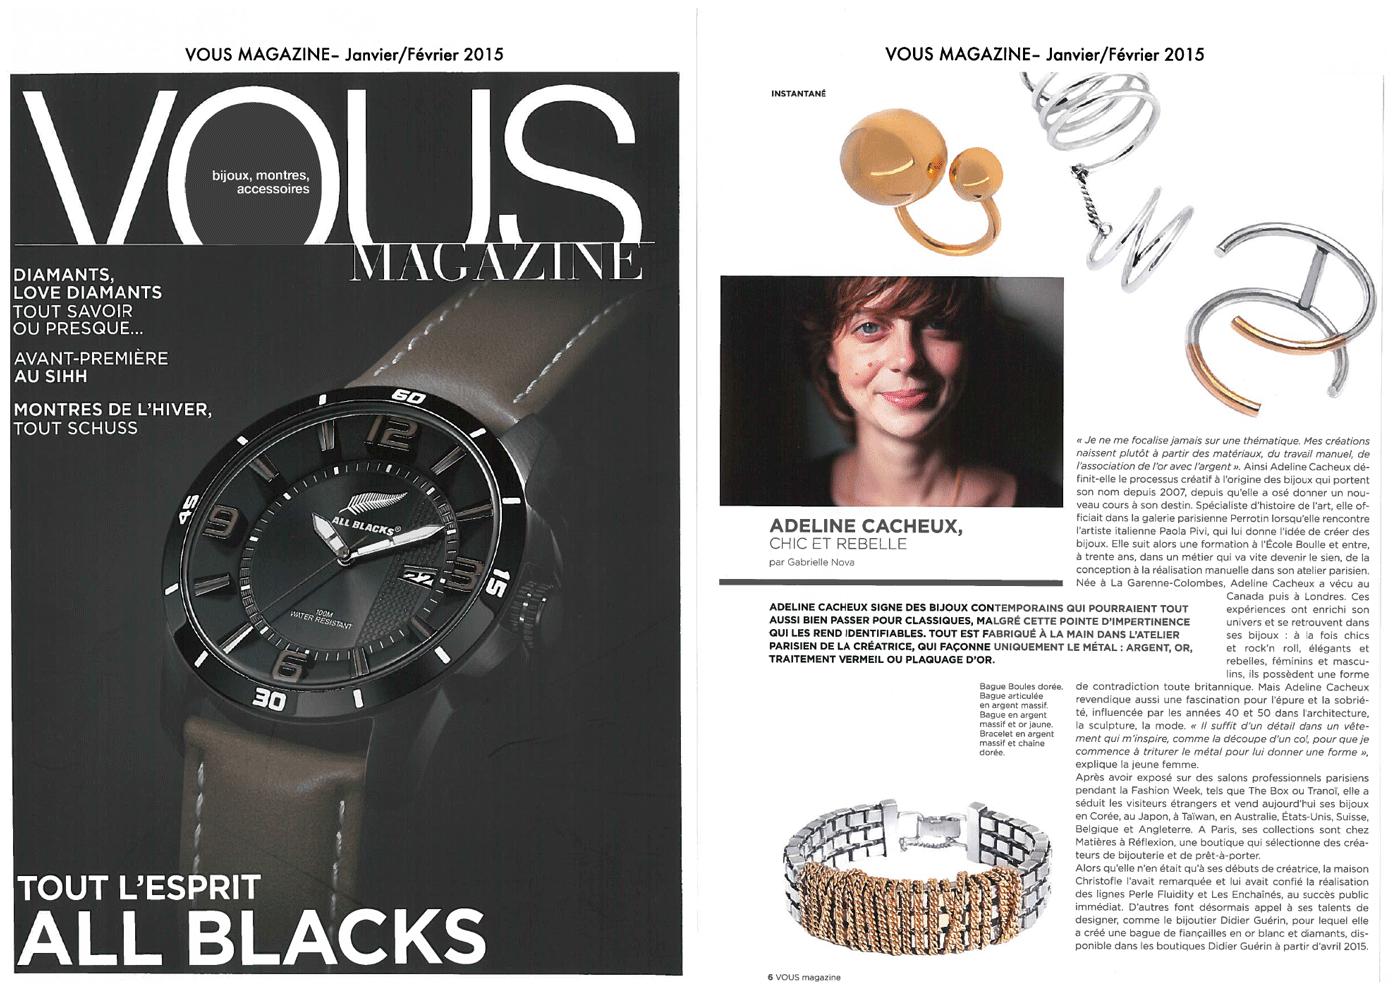 Adeline Cacheux Jewelry Design portrait adeline cacheux